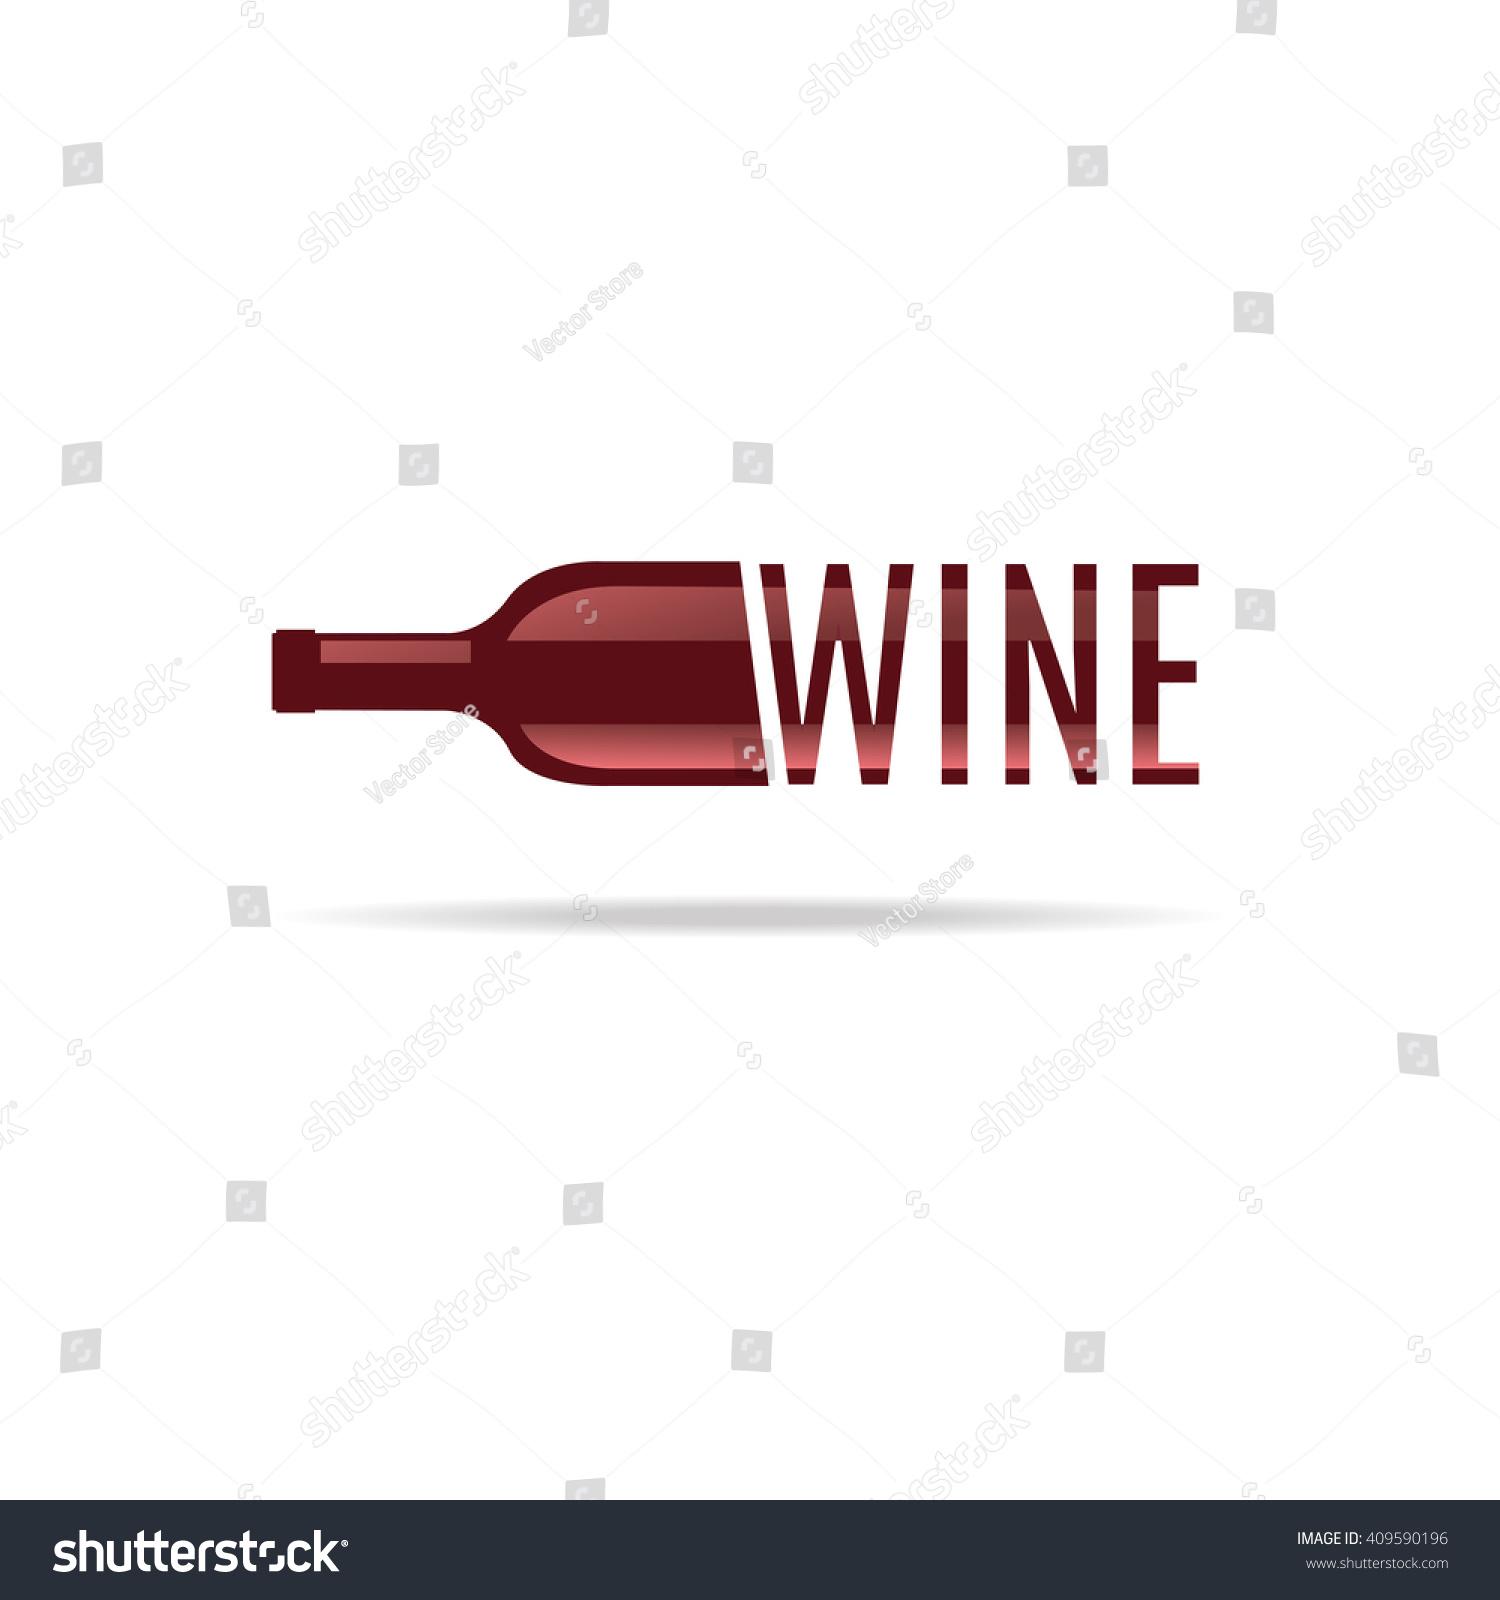 Bottle wine icon symbol menu bar stock vector 409590196 shutterstock bottle of wine icon and symbol for the menu bar restaurant biocorpaavc Gallery